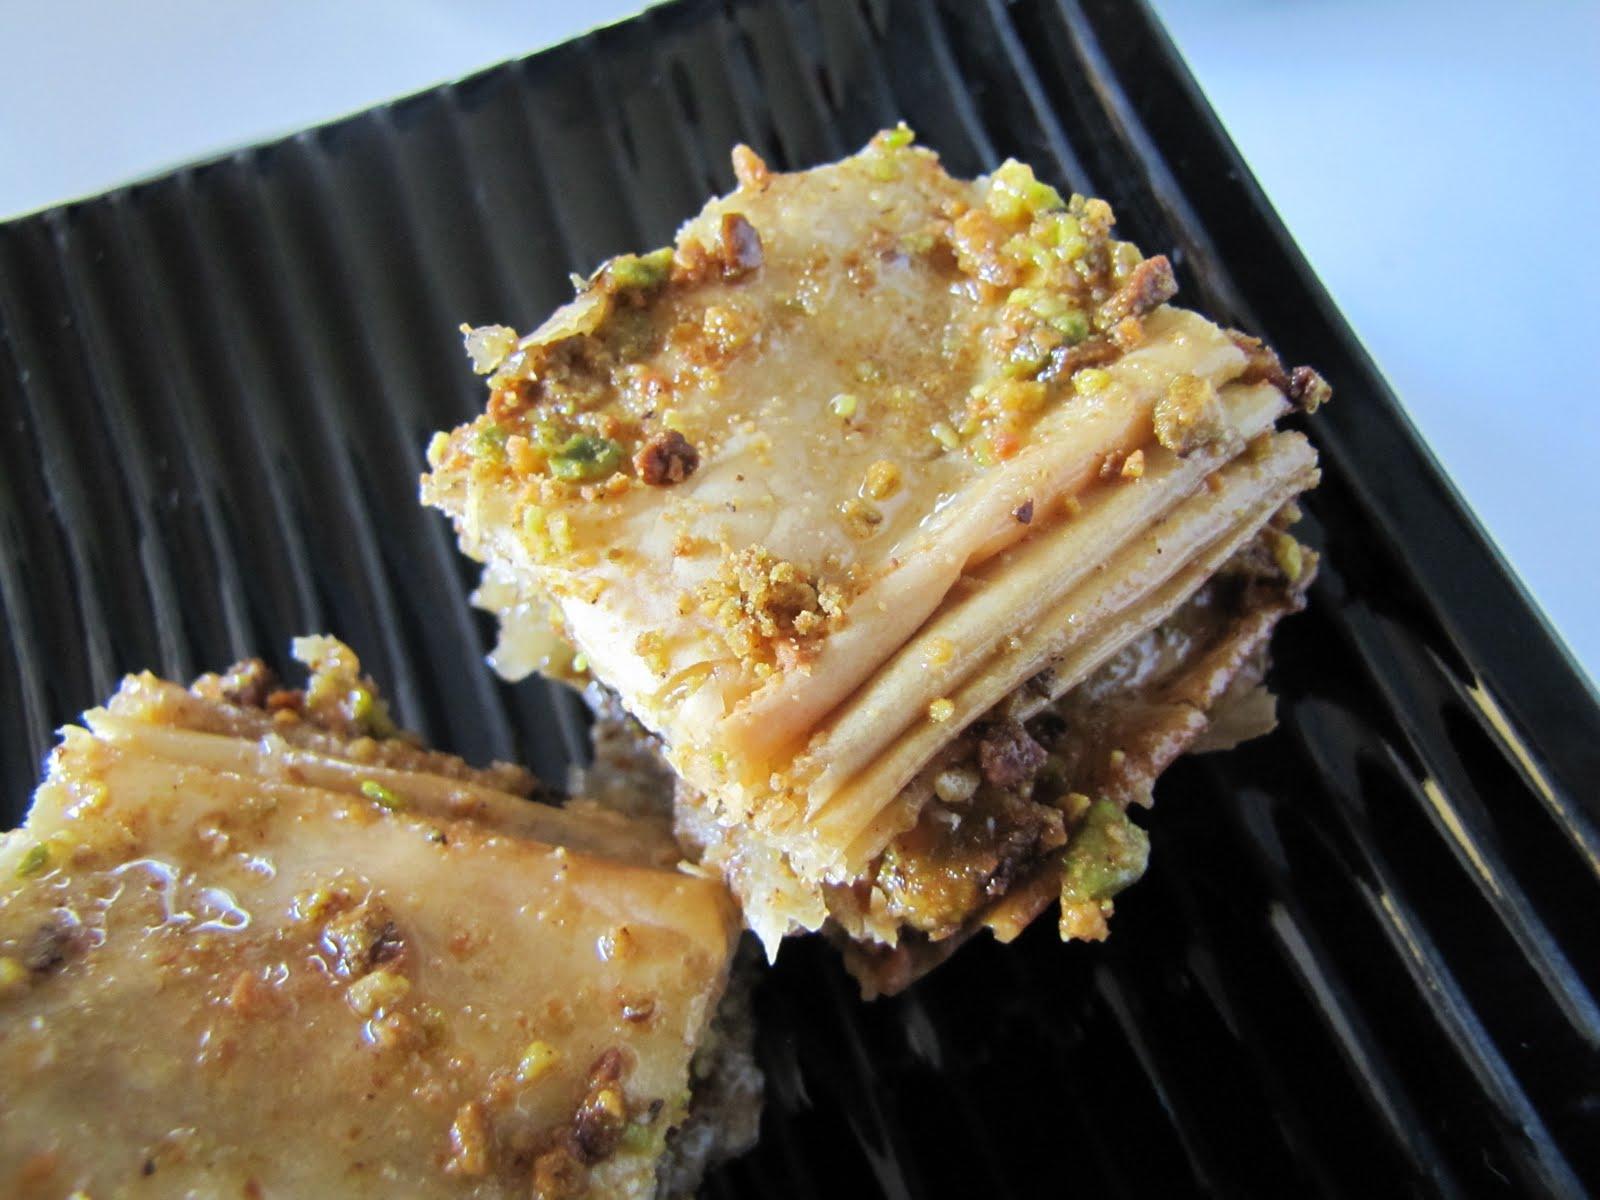 ... baklava baklava french toast pistachio baklava a turkish dessert